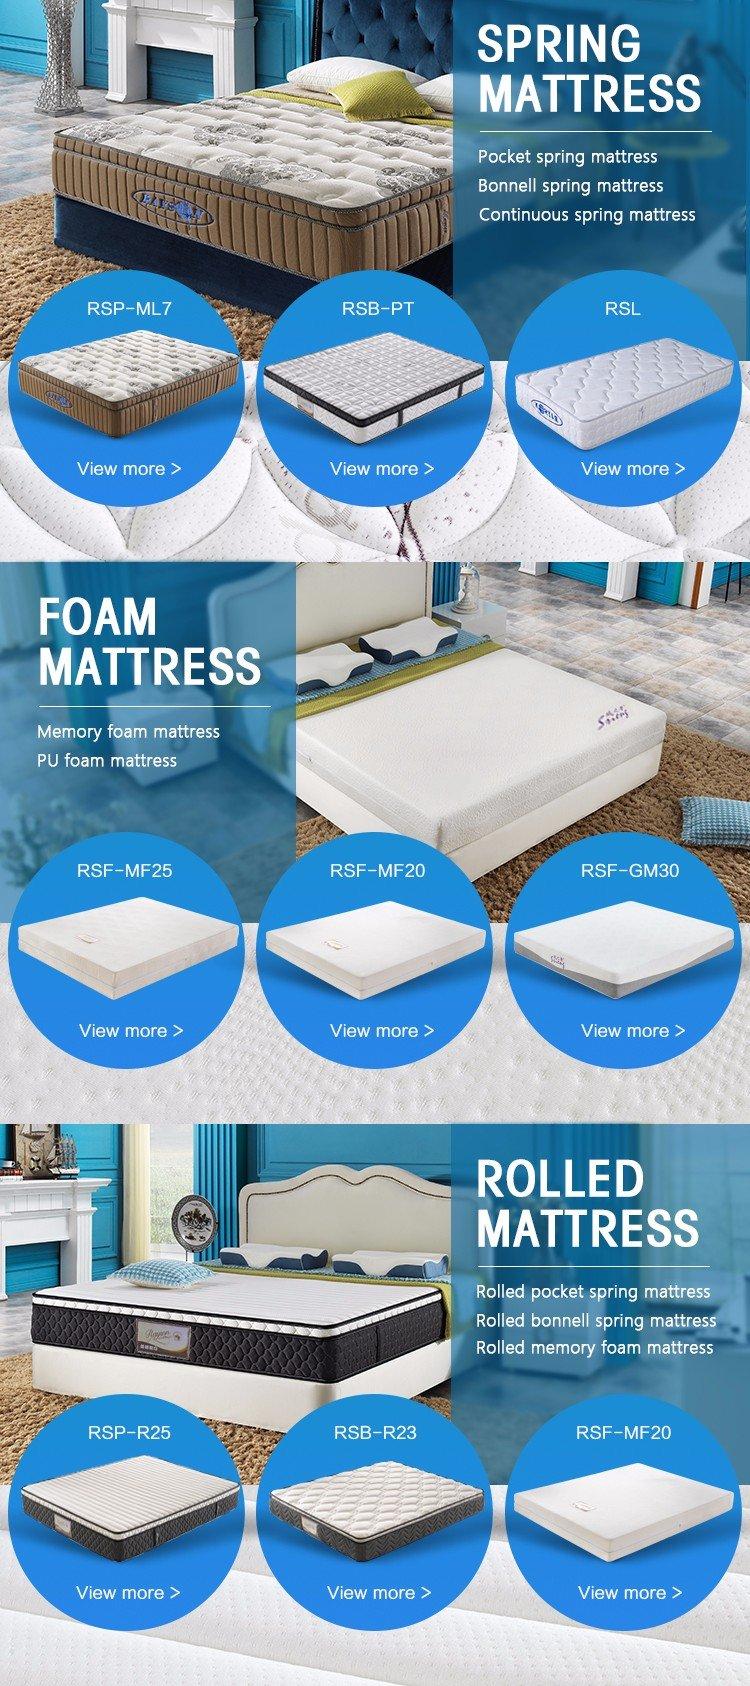 China Distributors Oem Cheap Mattress Hospital Bed Mat-7